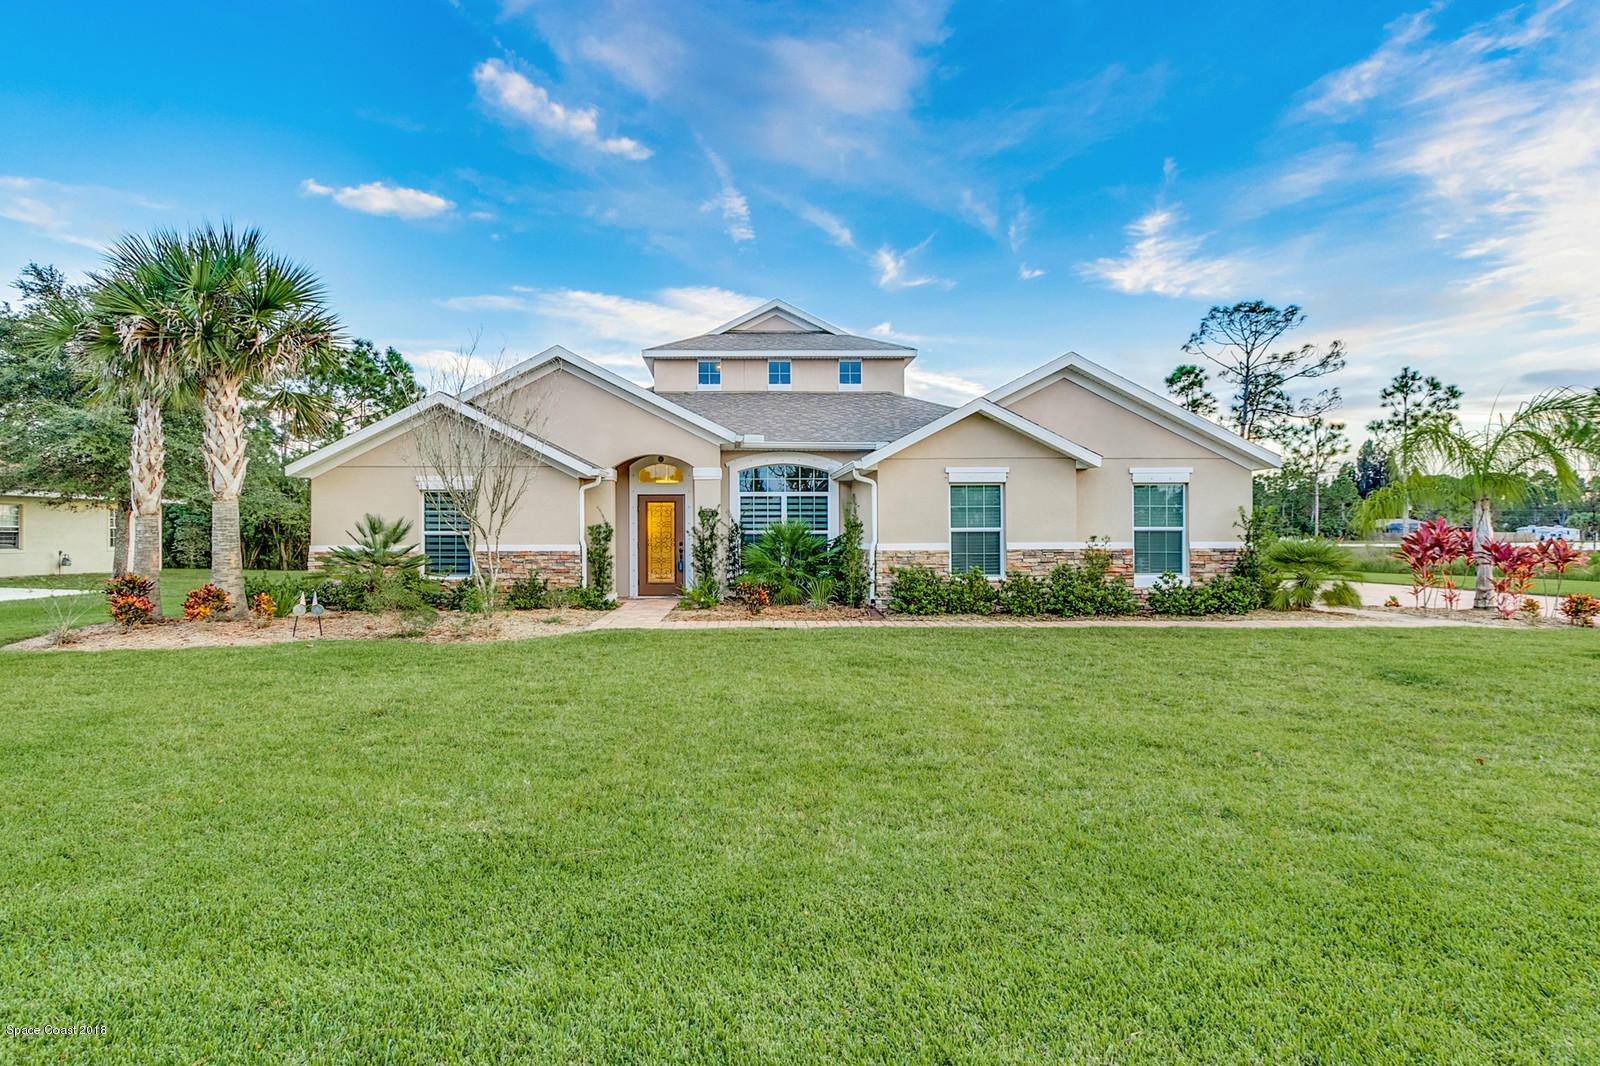 Single Family Home for Sale at 2191 Windbrook 2191 Windbrook Palm Bay, Florida 32909 United States